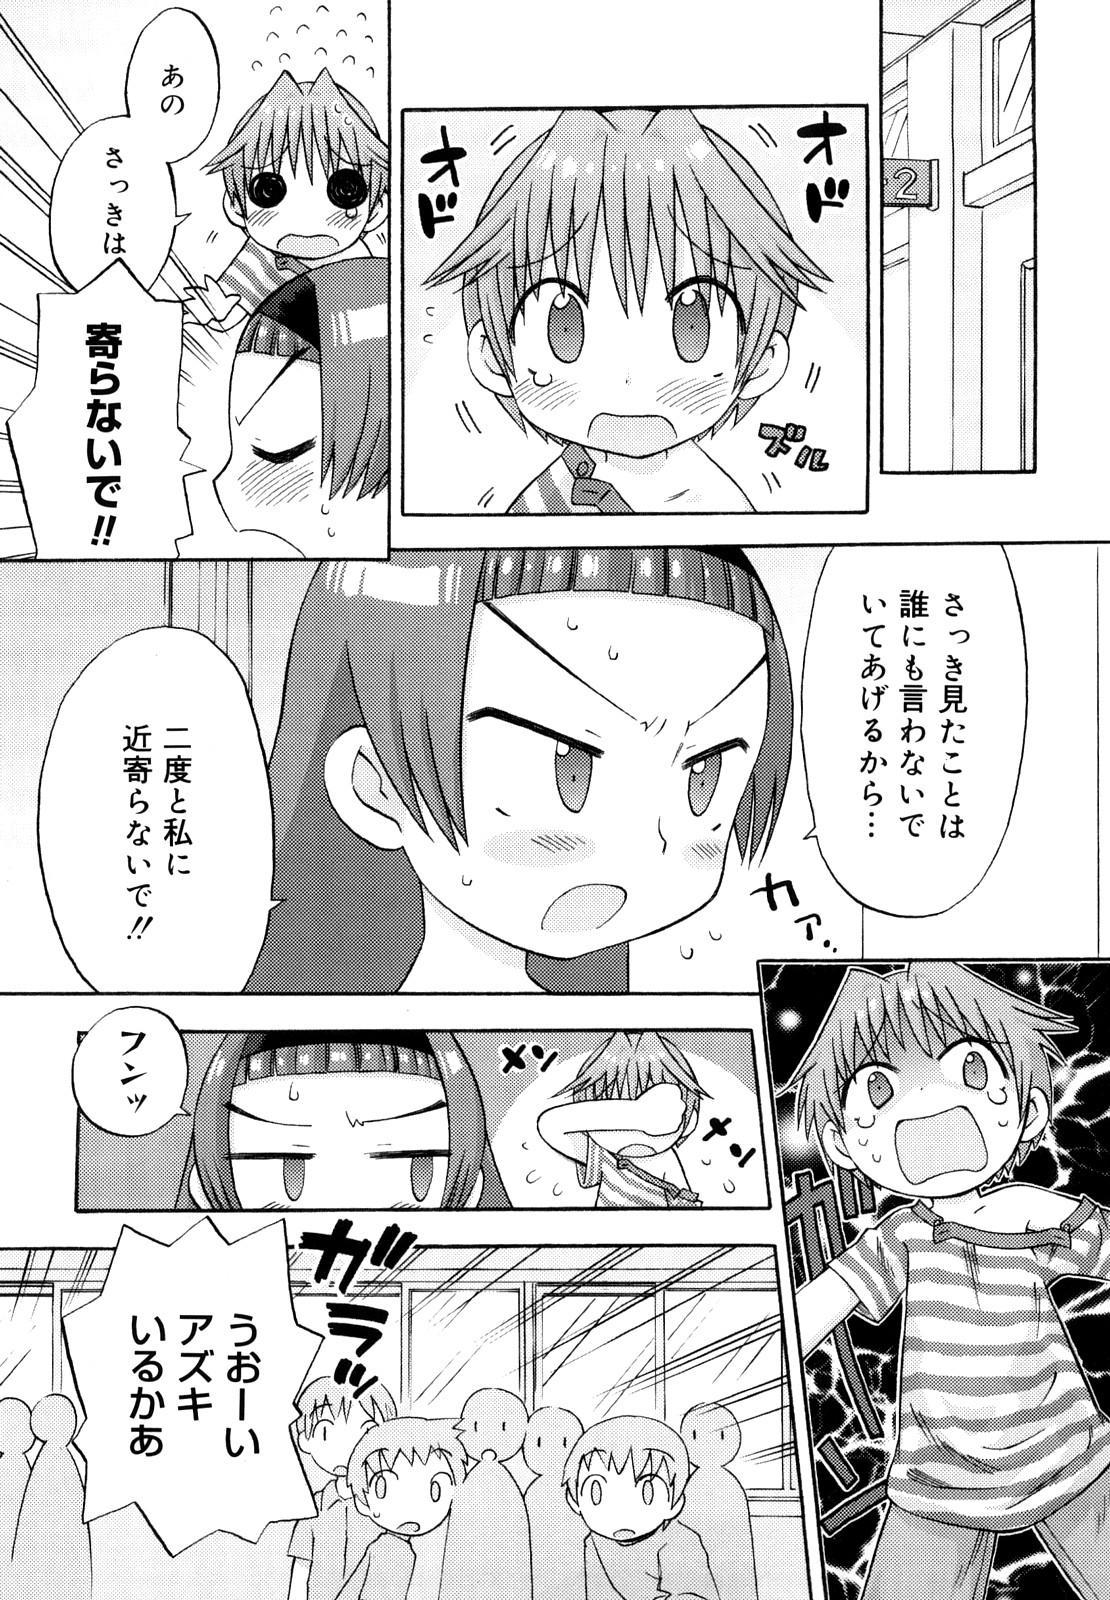 Hatsuden Pandakun! Shinsouban 21